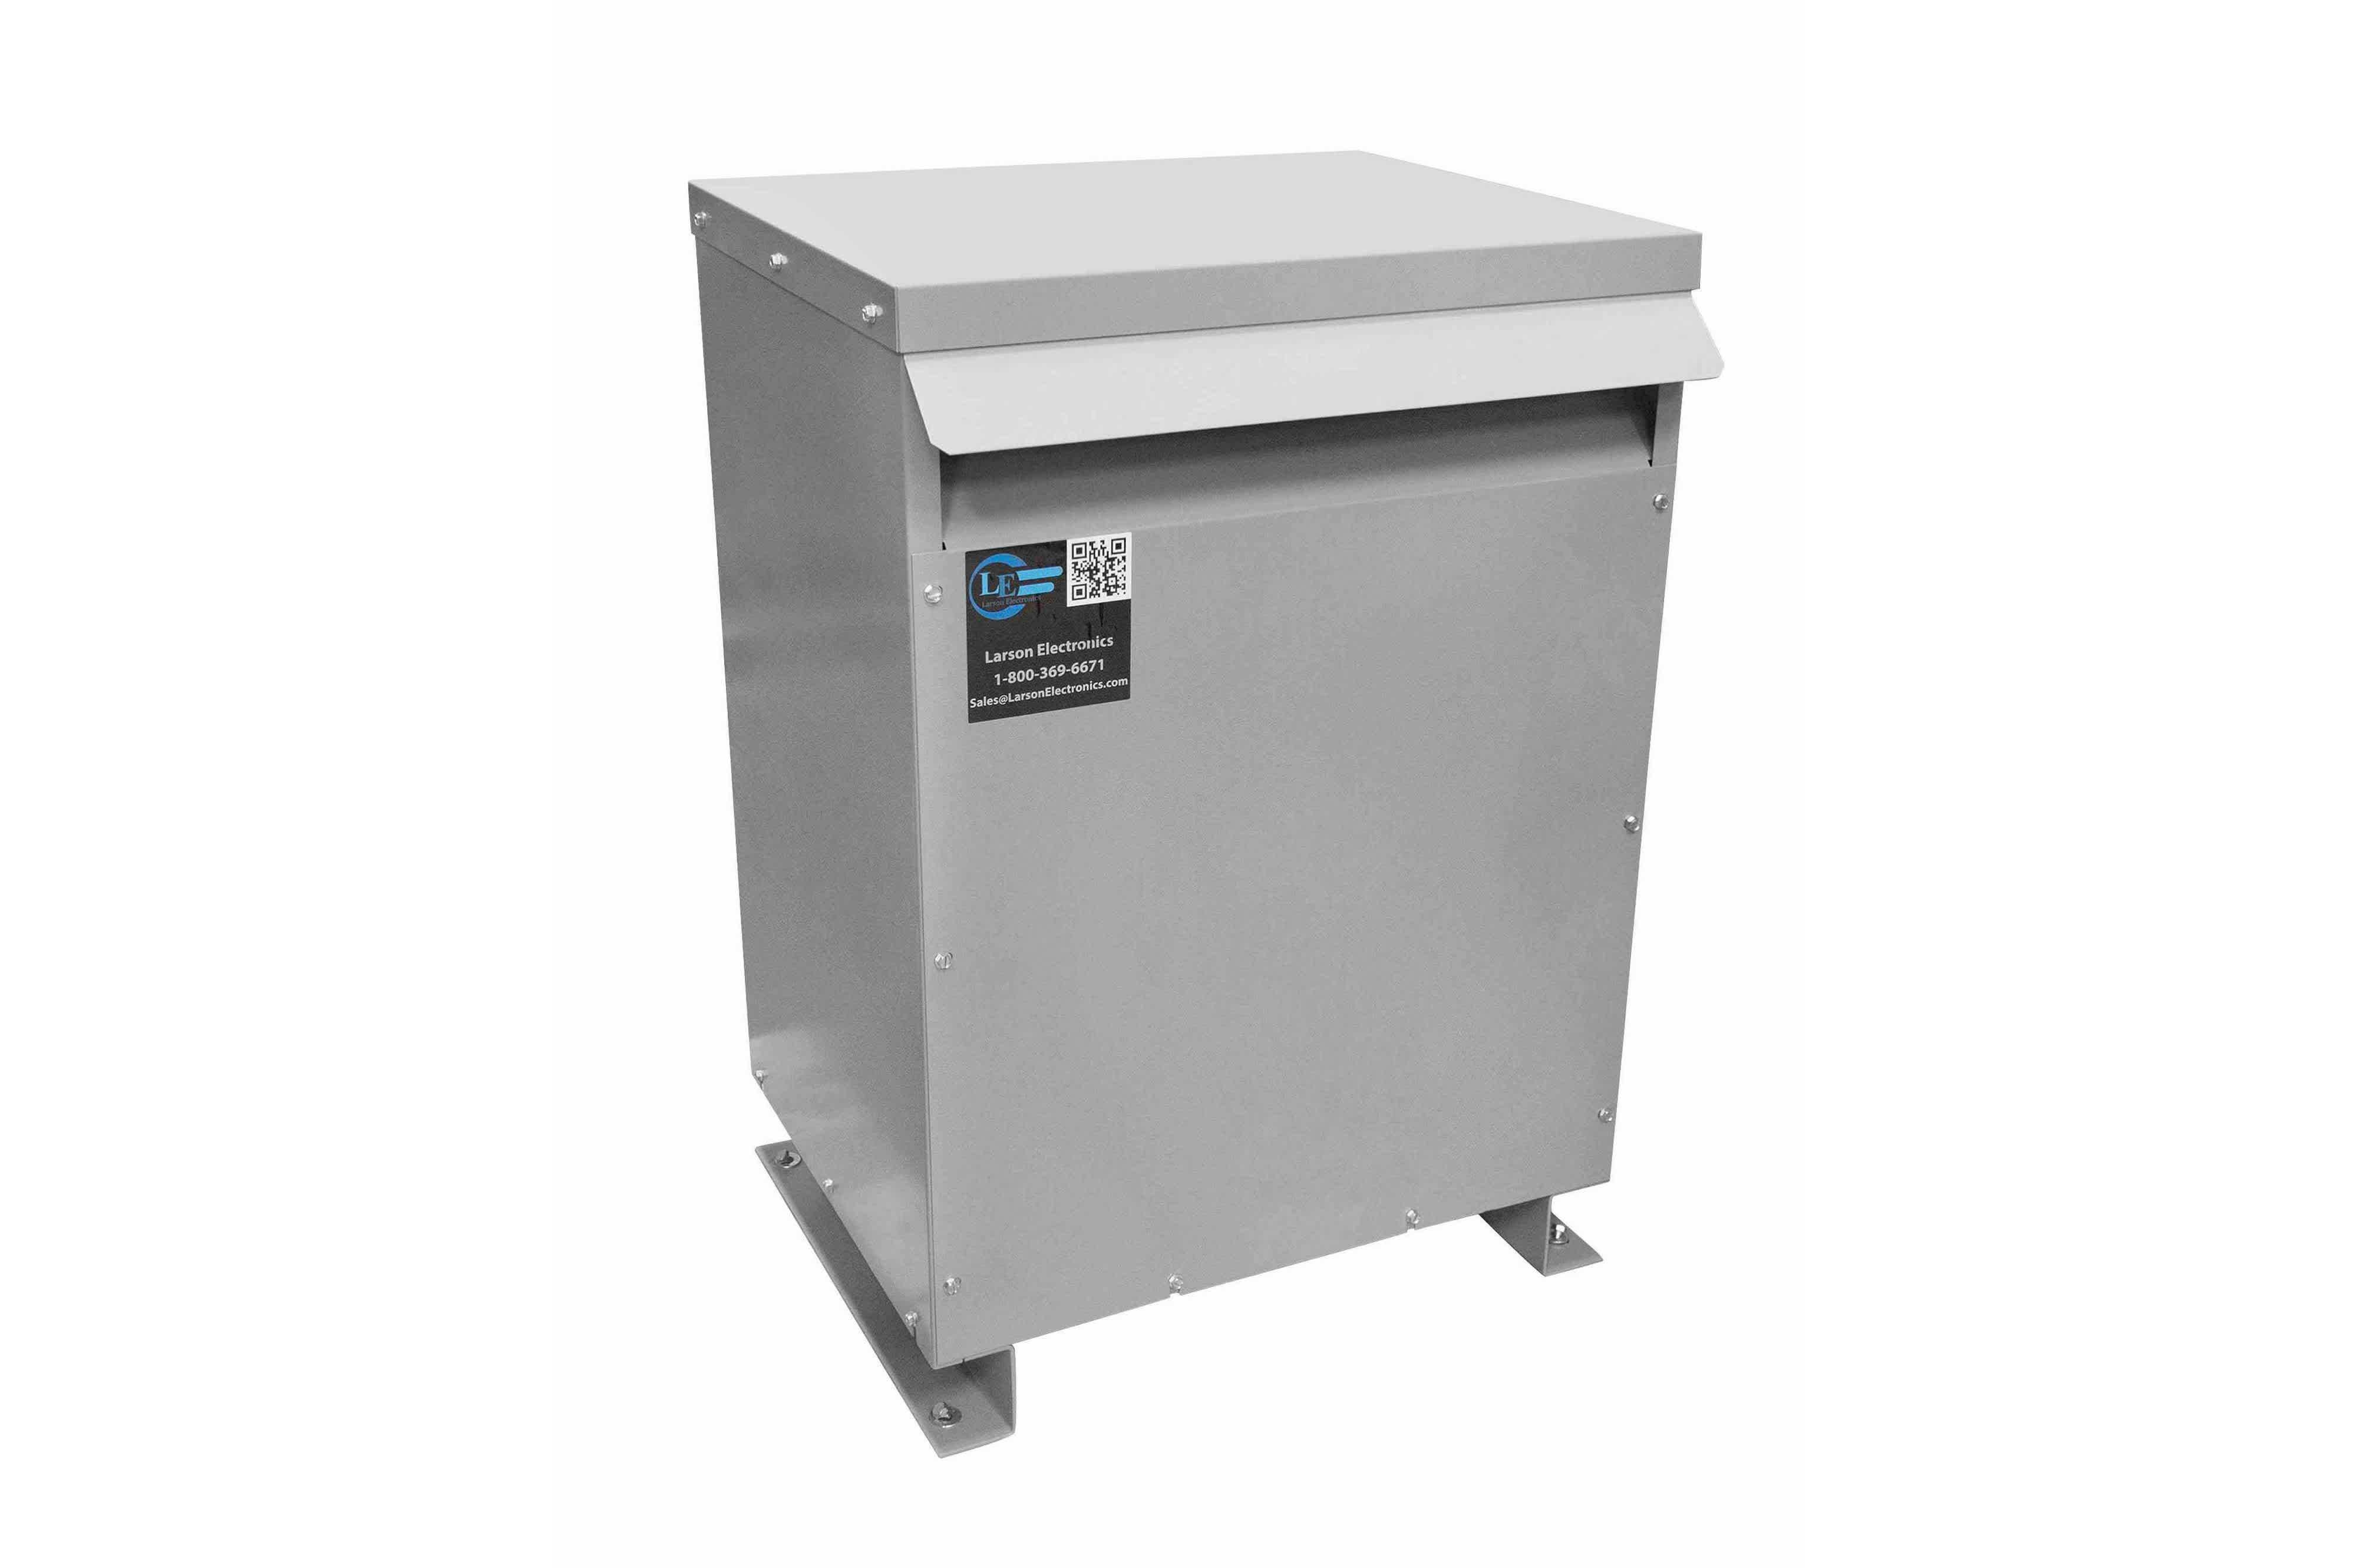 300 kVA 3PH DOE Transformer, 380V Delta Primary, 208Y/120 Wye-N Secondary, N3R, Ventilated, 60 Hz